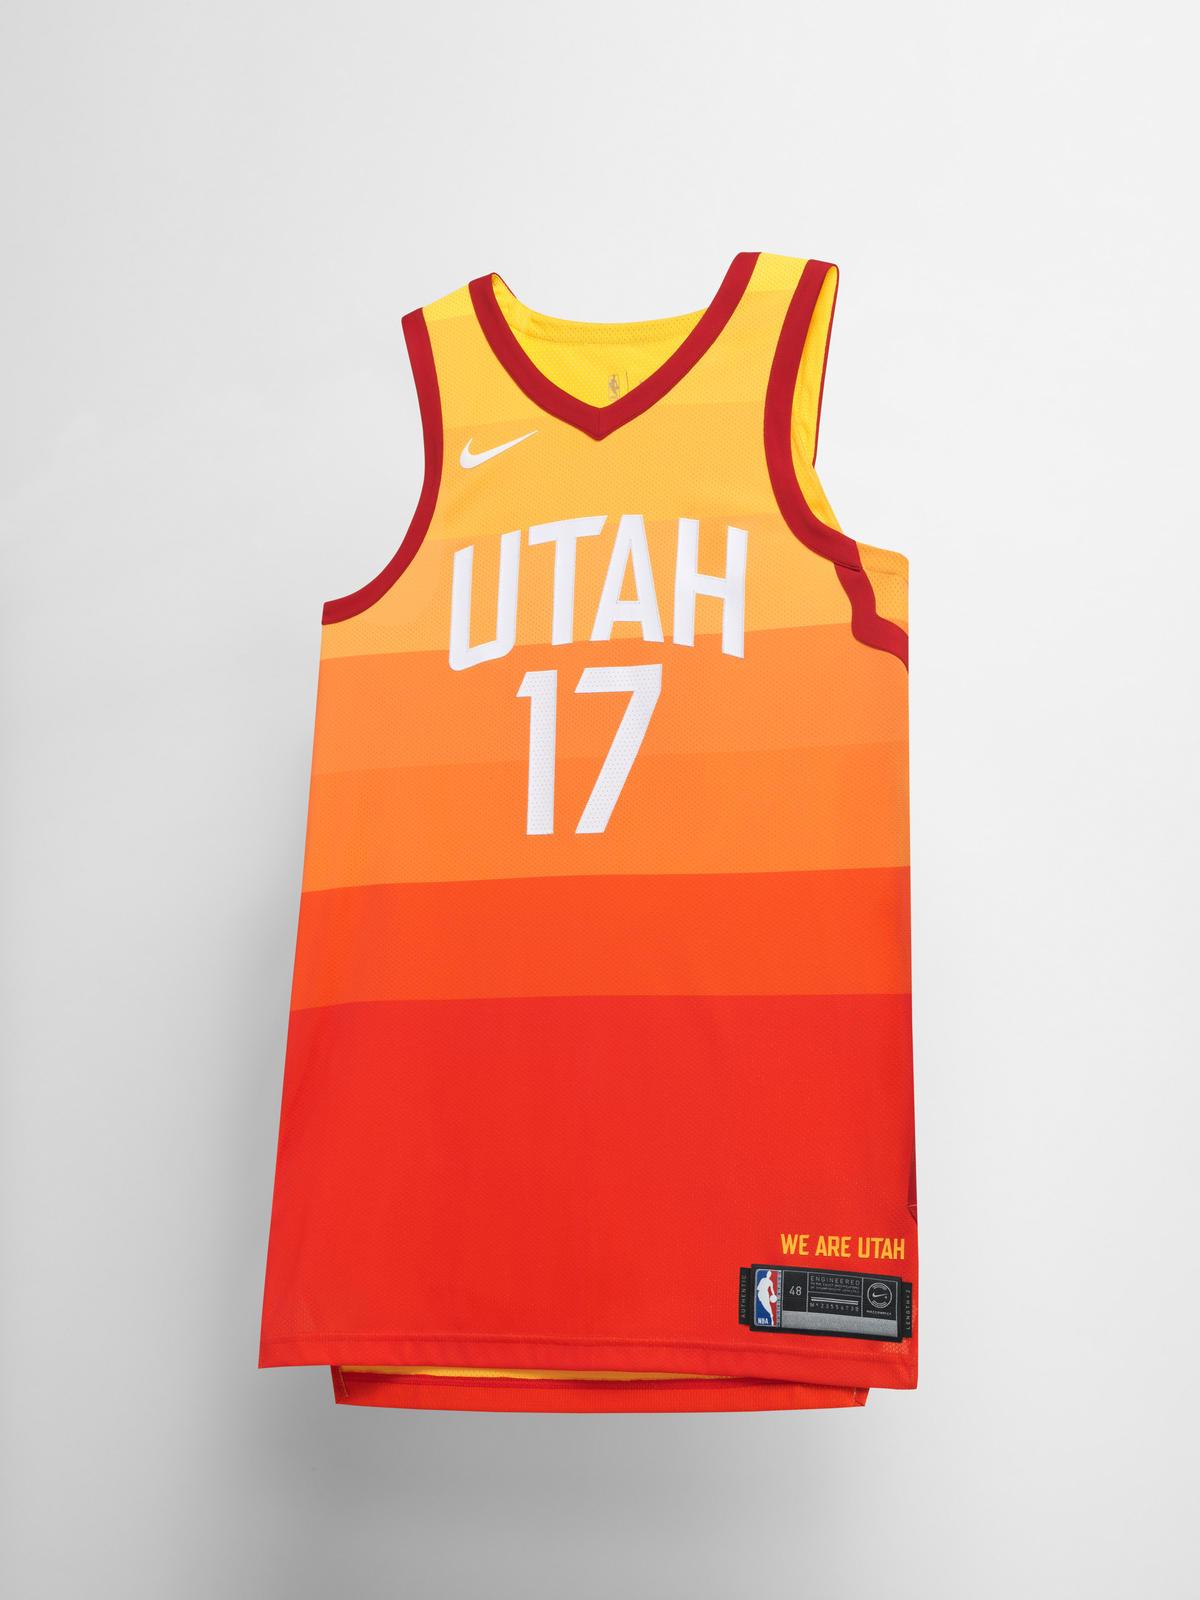 NBA City Edition jerseys  Photos of the final new Nike jersey  5b4efb79c